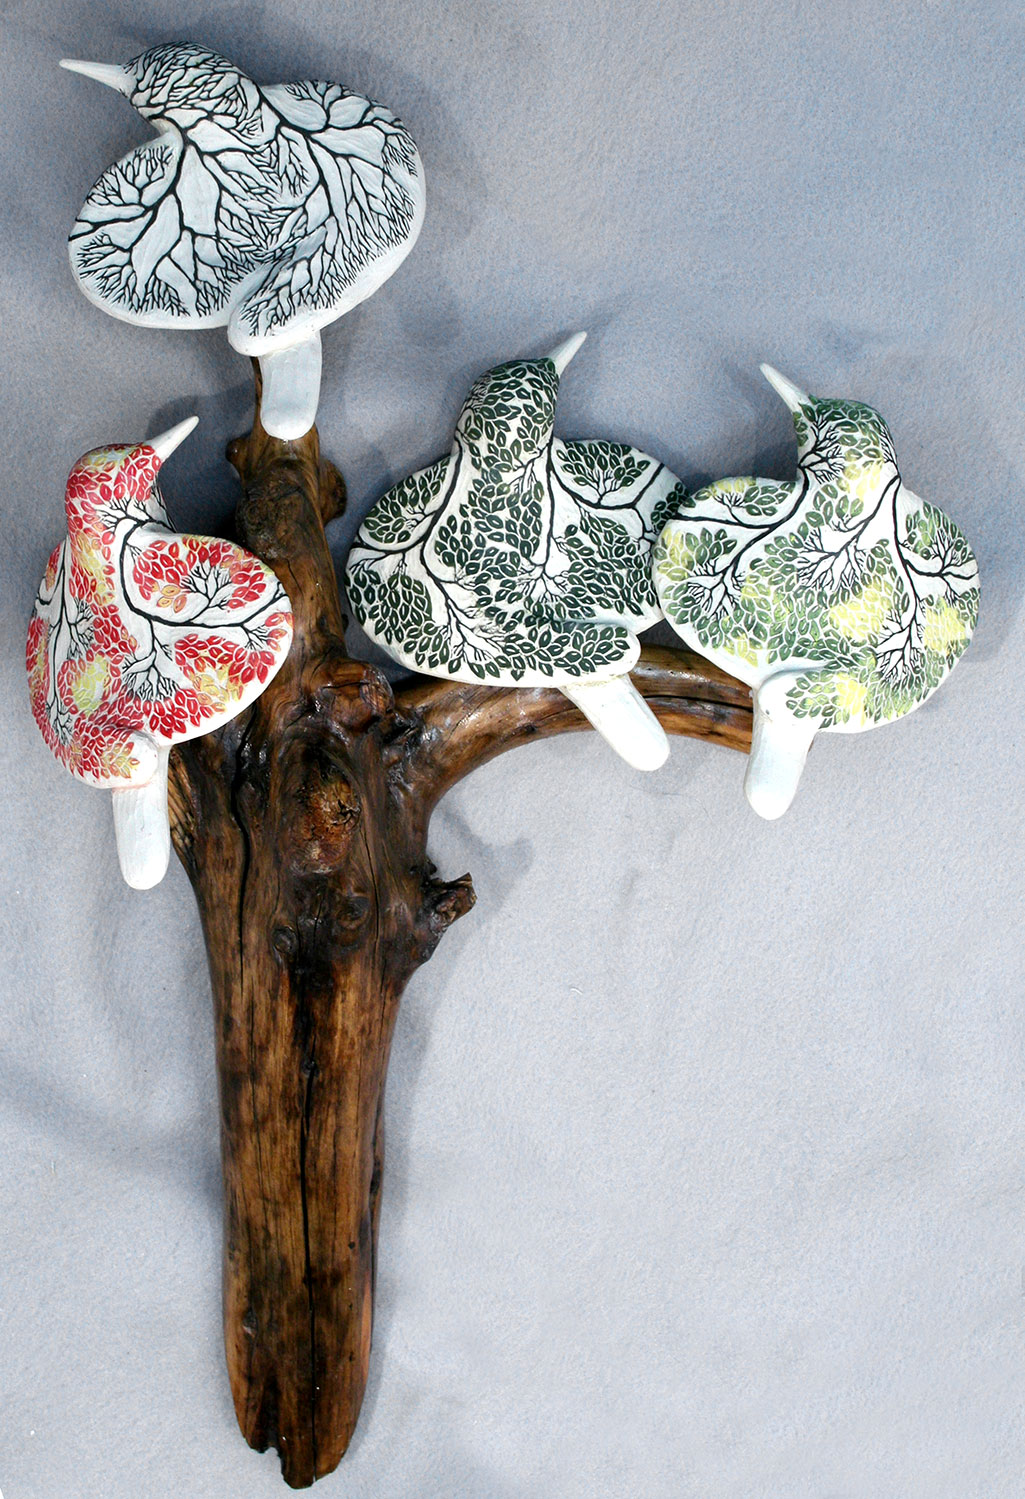 cathy weber - art - clay - woman - montana - ceramic - porcelain - bird - season - forest - carved - tree